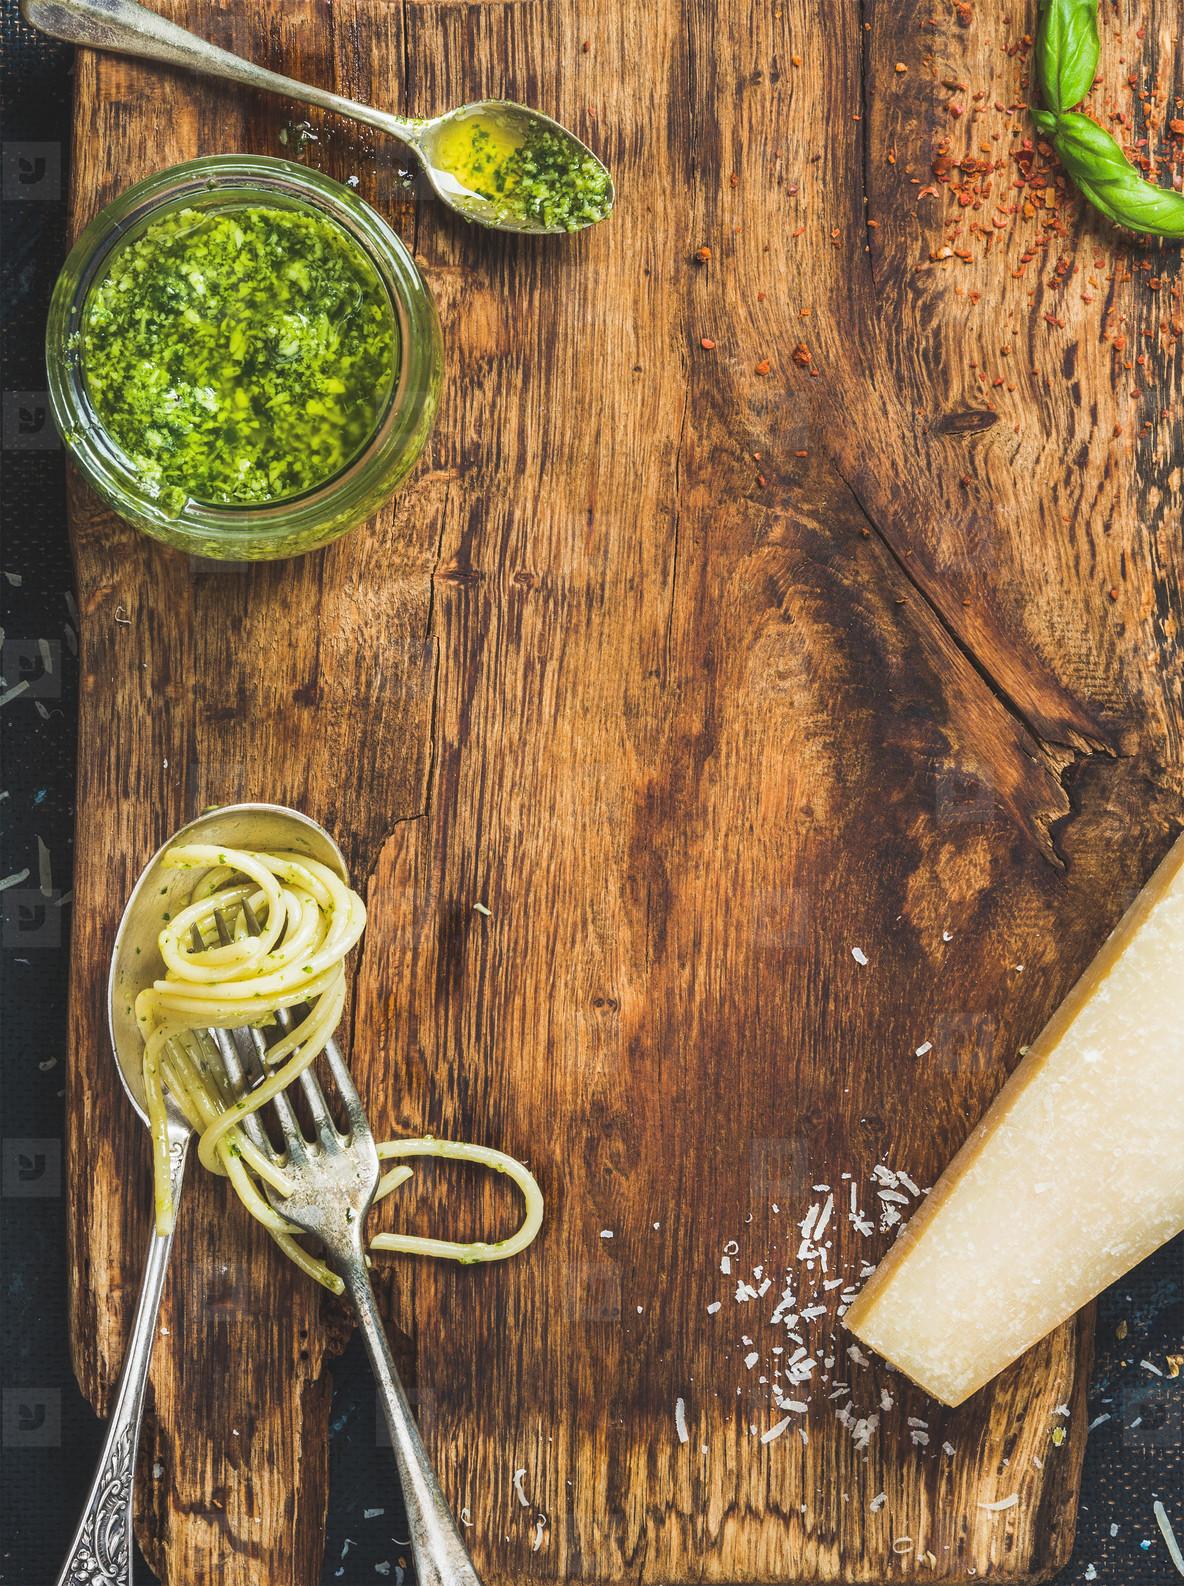 Italian cuisine cooking background  rustic wooden board texture